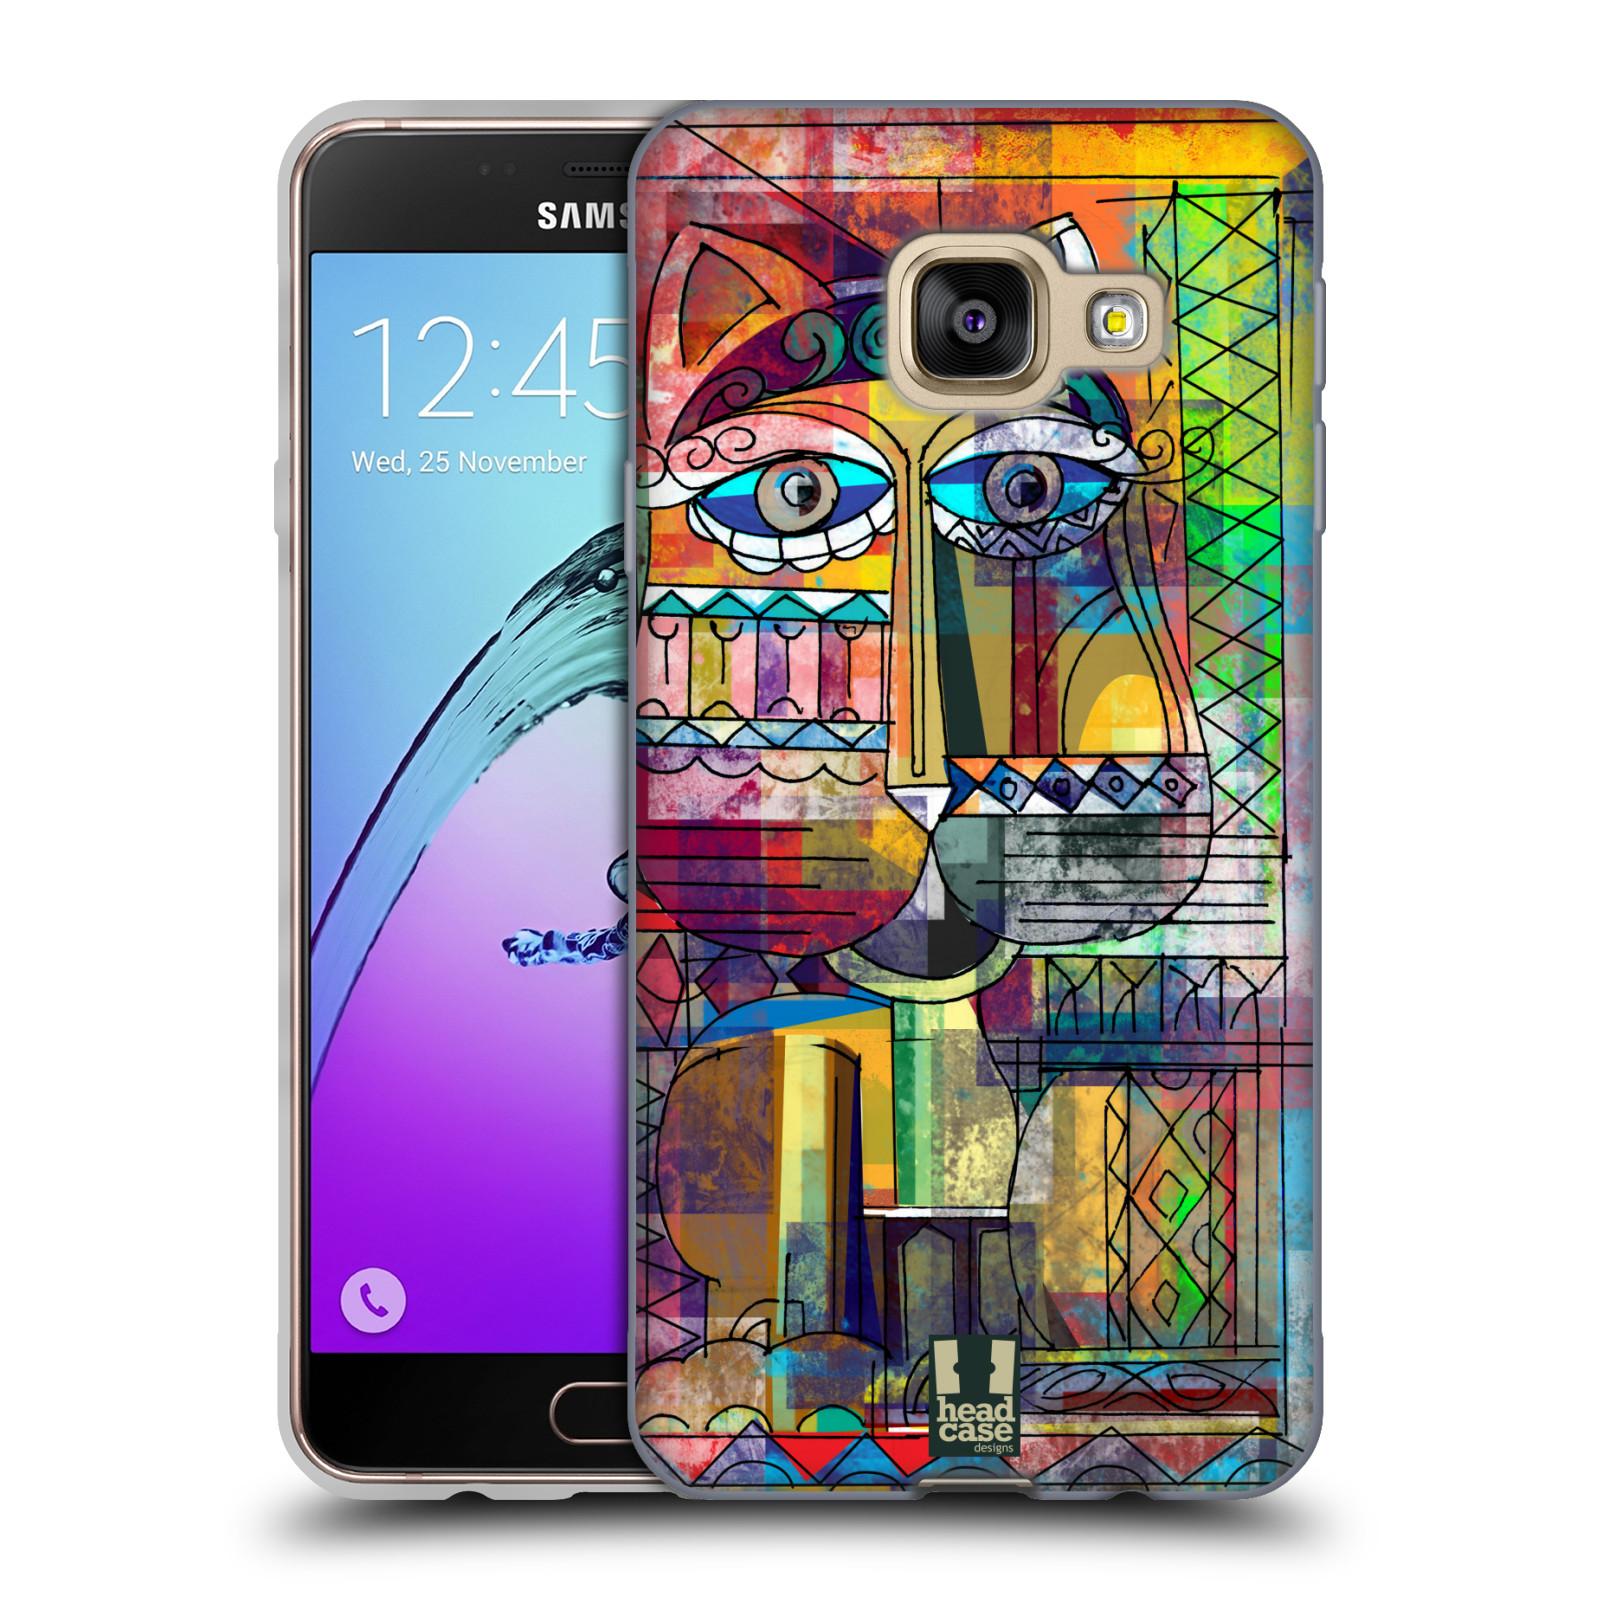 Silikonové pouzdro na mobil Samsung Galaxy A3 (2016) HEAD CASE AZTEC KORAT